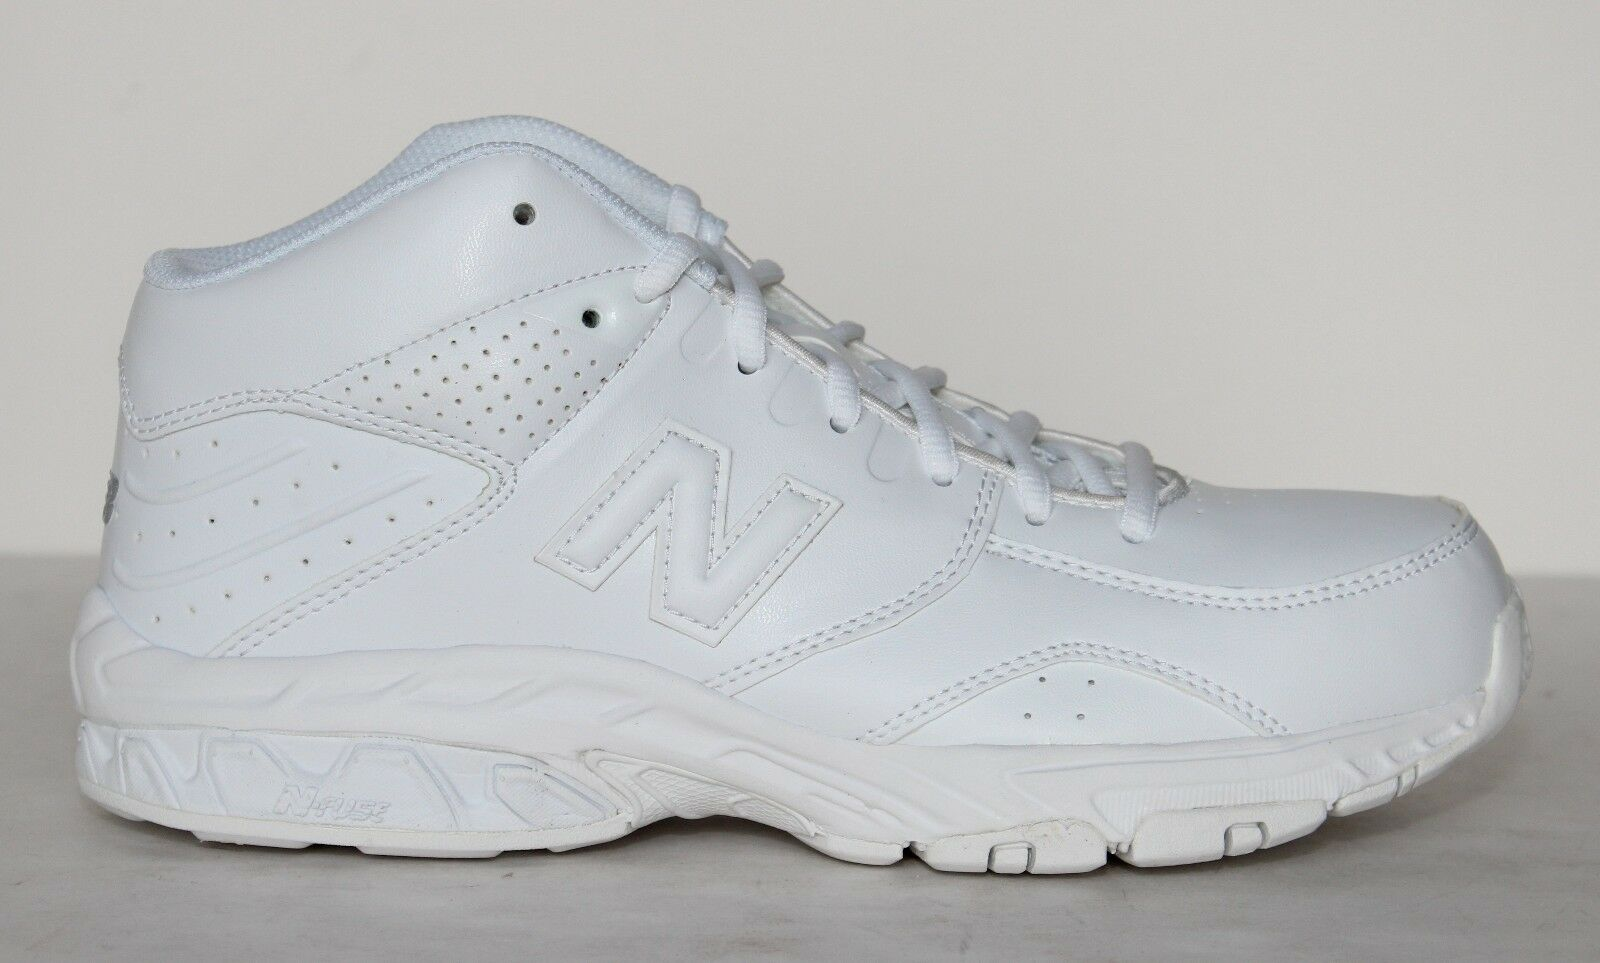 NEW BALANCE BB581WT Wht Mens Basketball shoes 4E Width - NWD